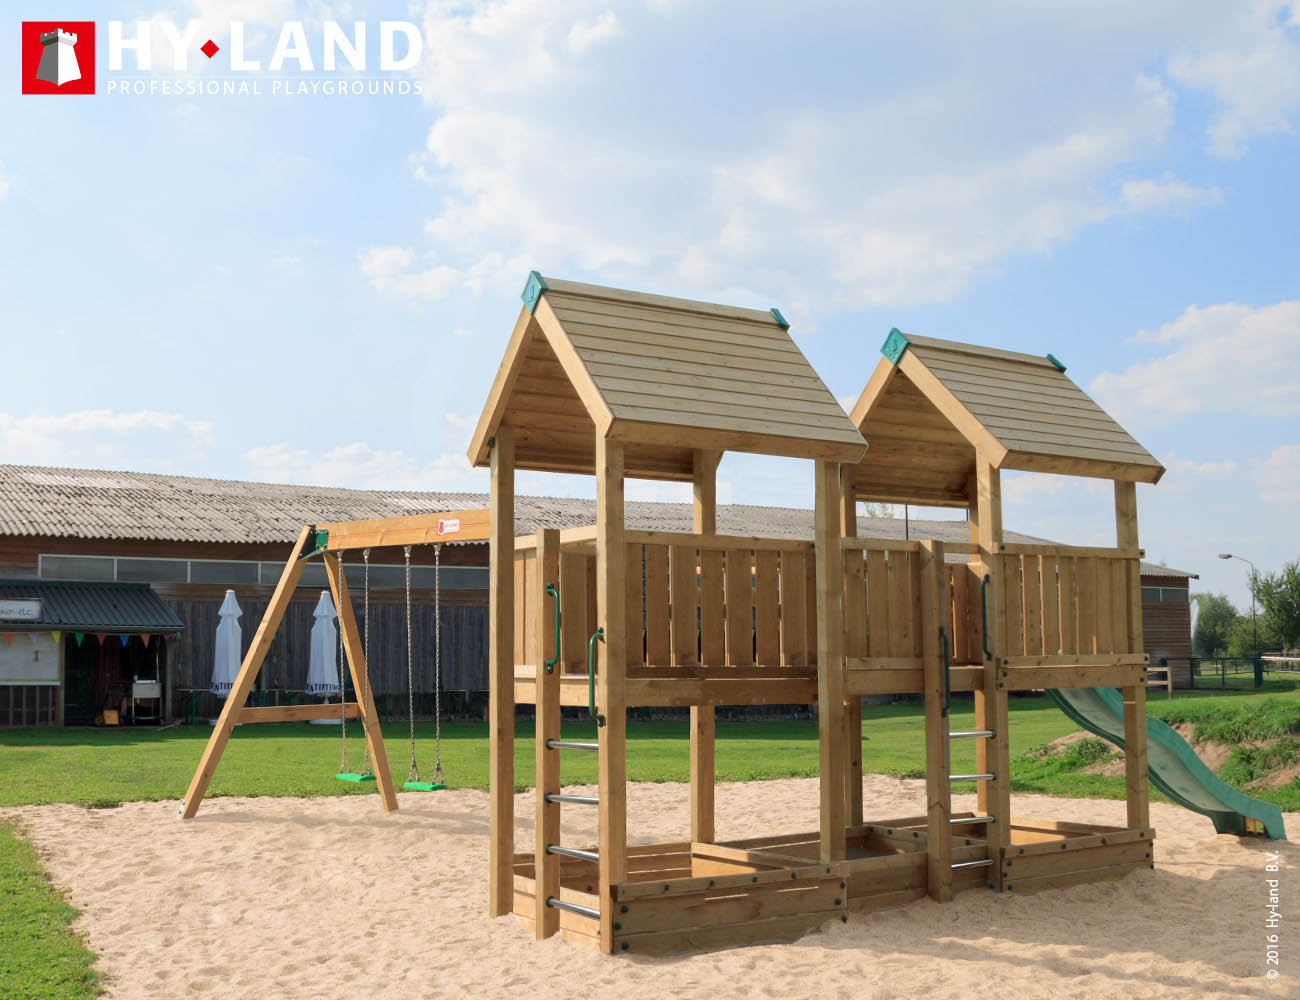 Hy-Land Projekt 4S – Bild 3